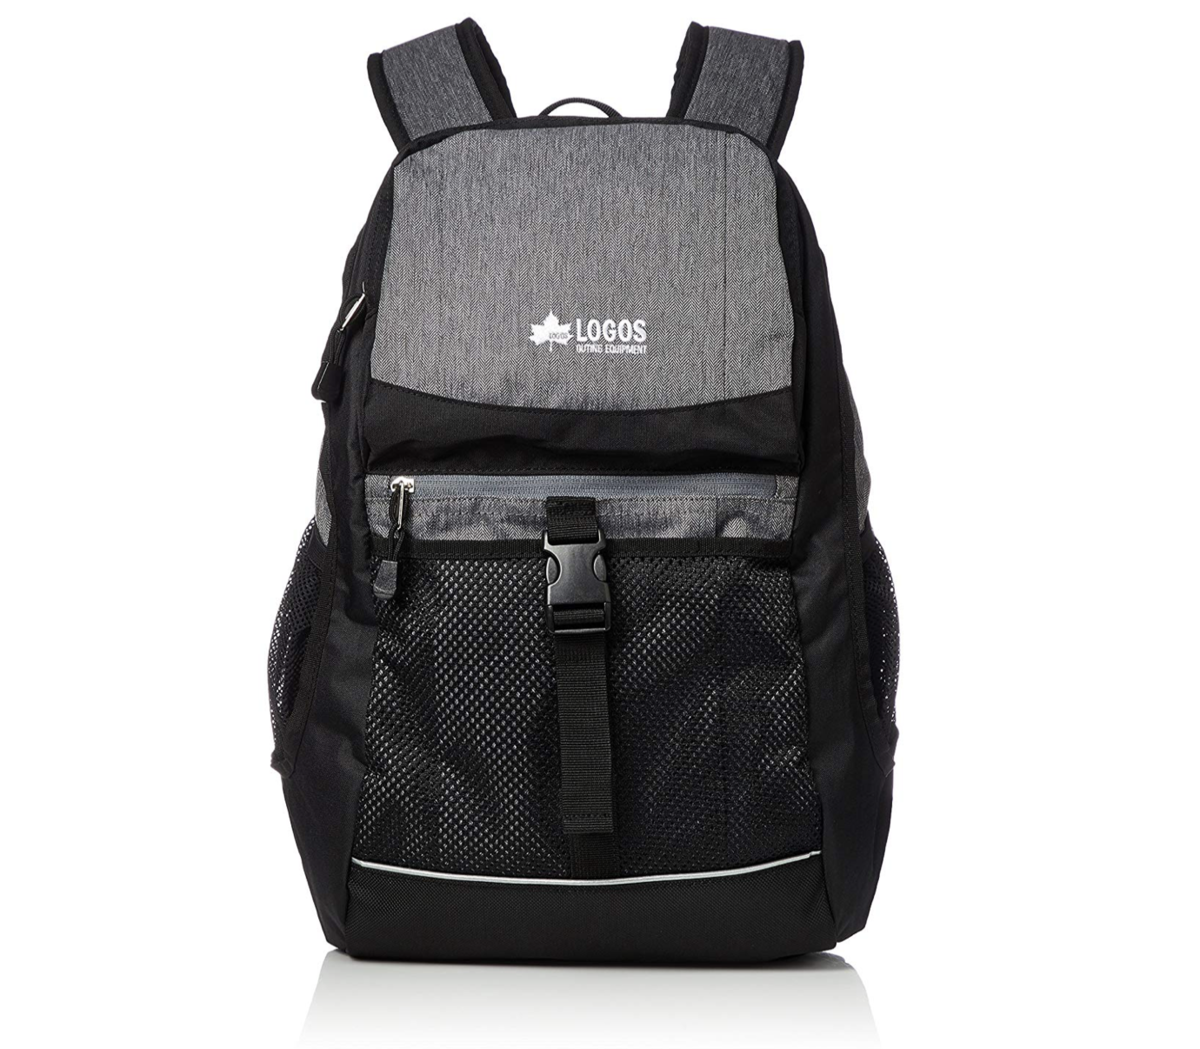 f:id:thebackpack:20190317103429p:plain